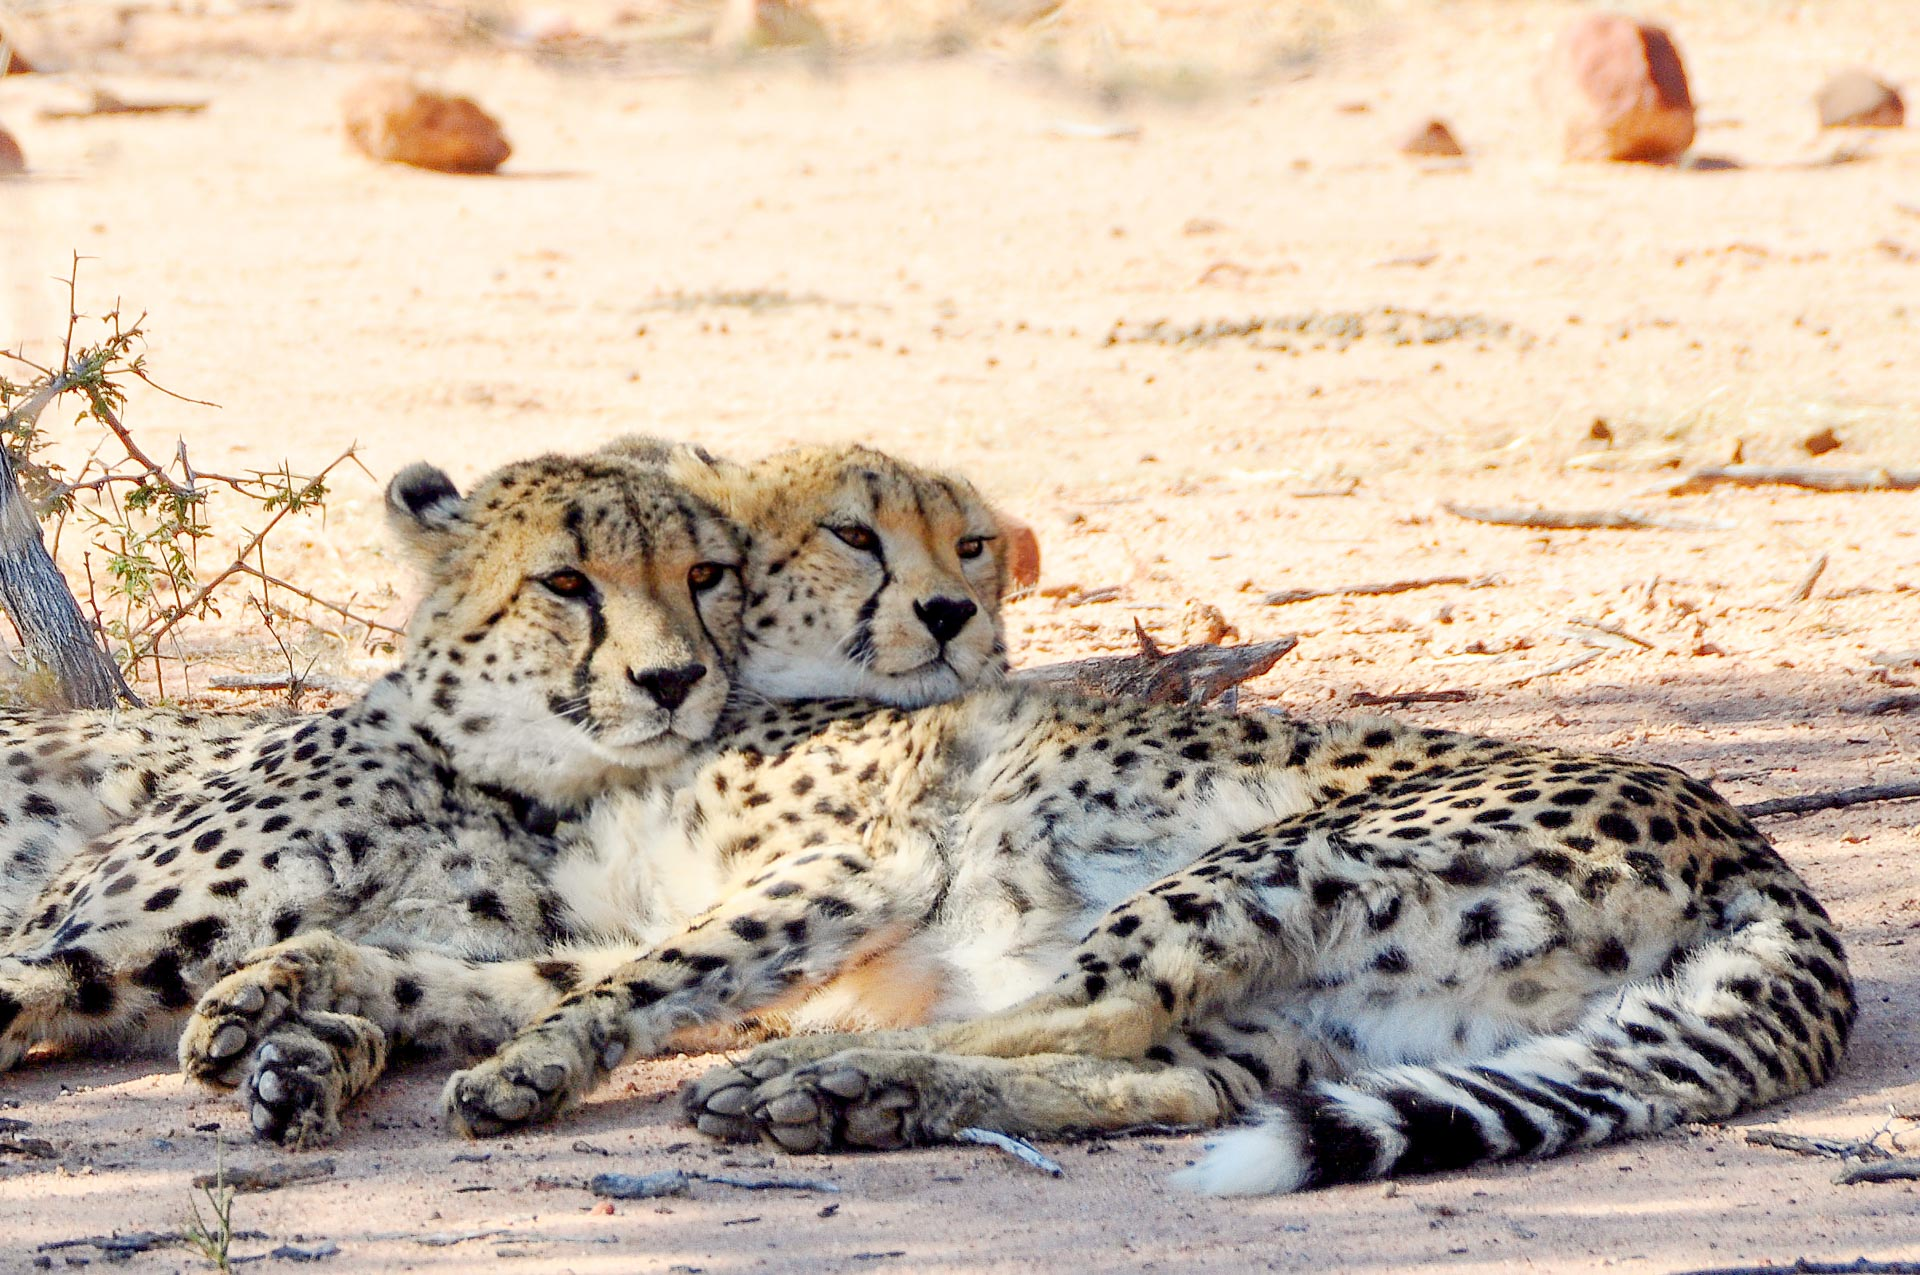 Okonjima-Namibia-Globetrotter-Select-13